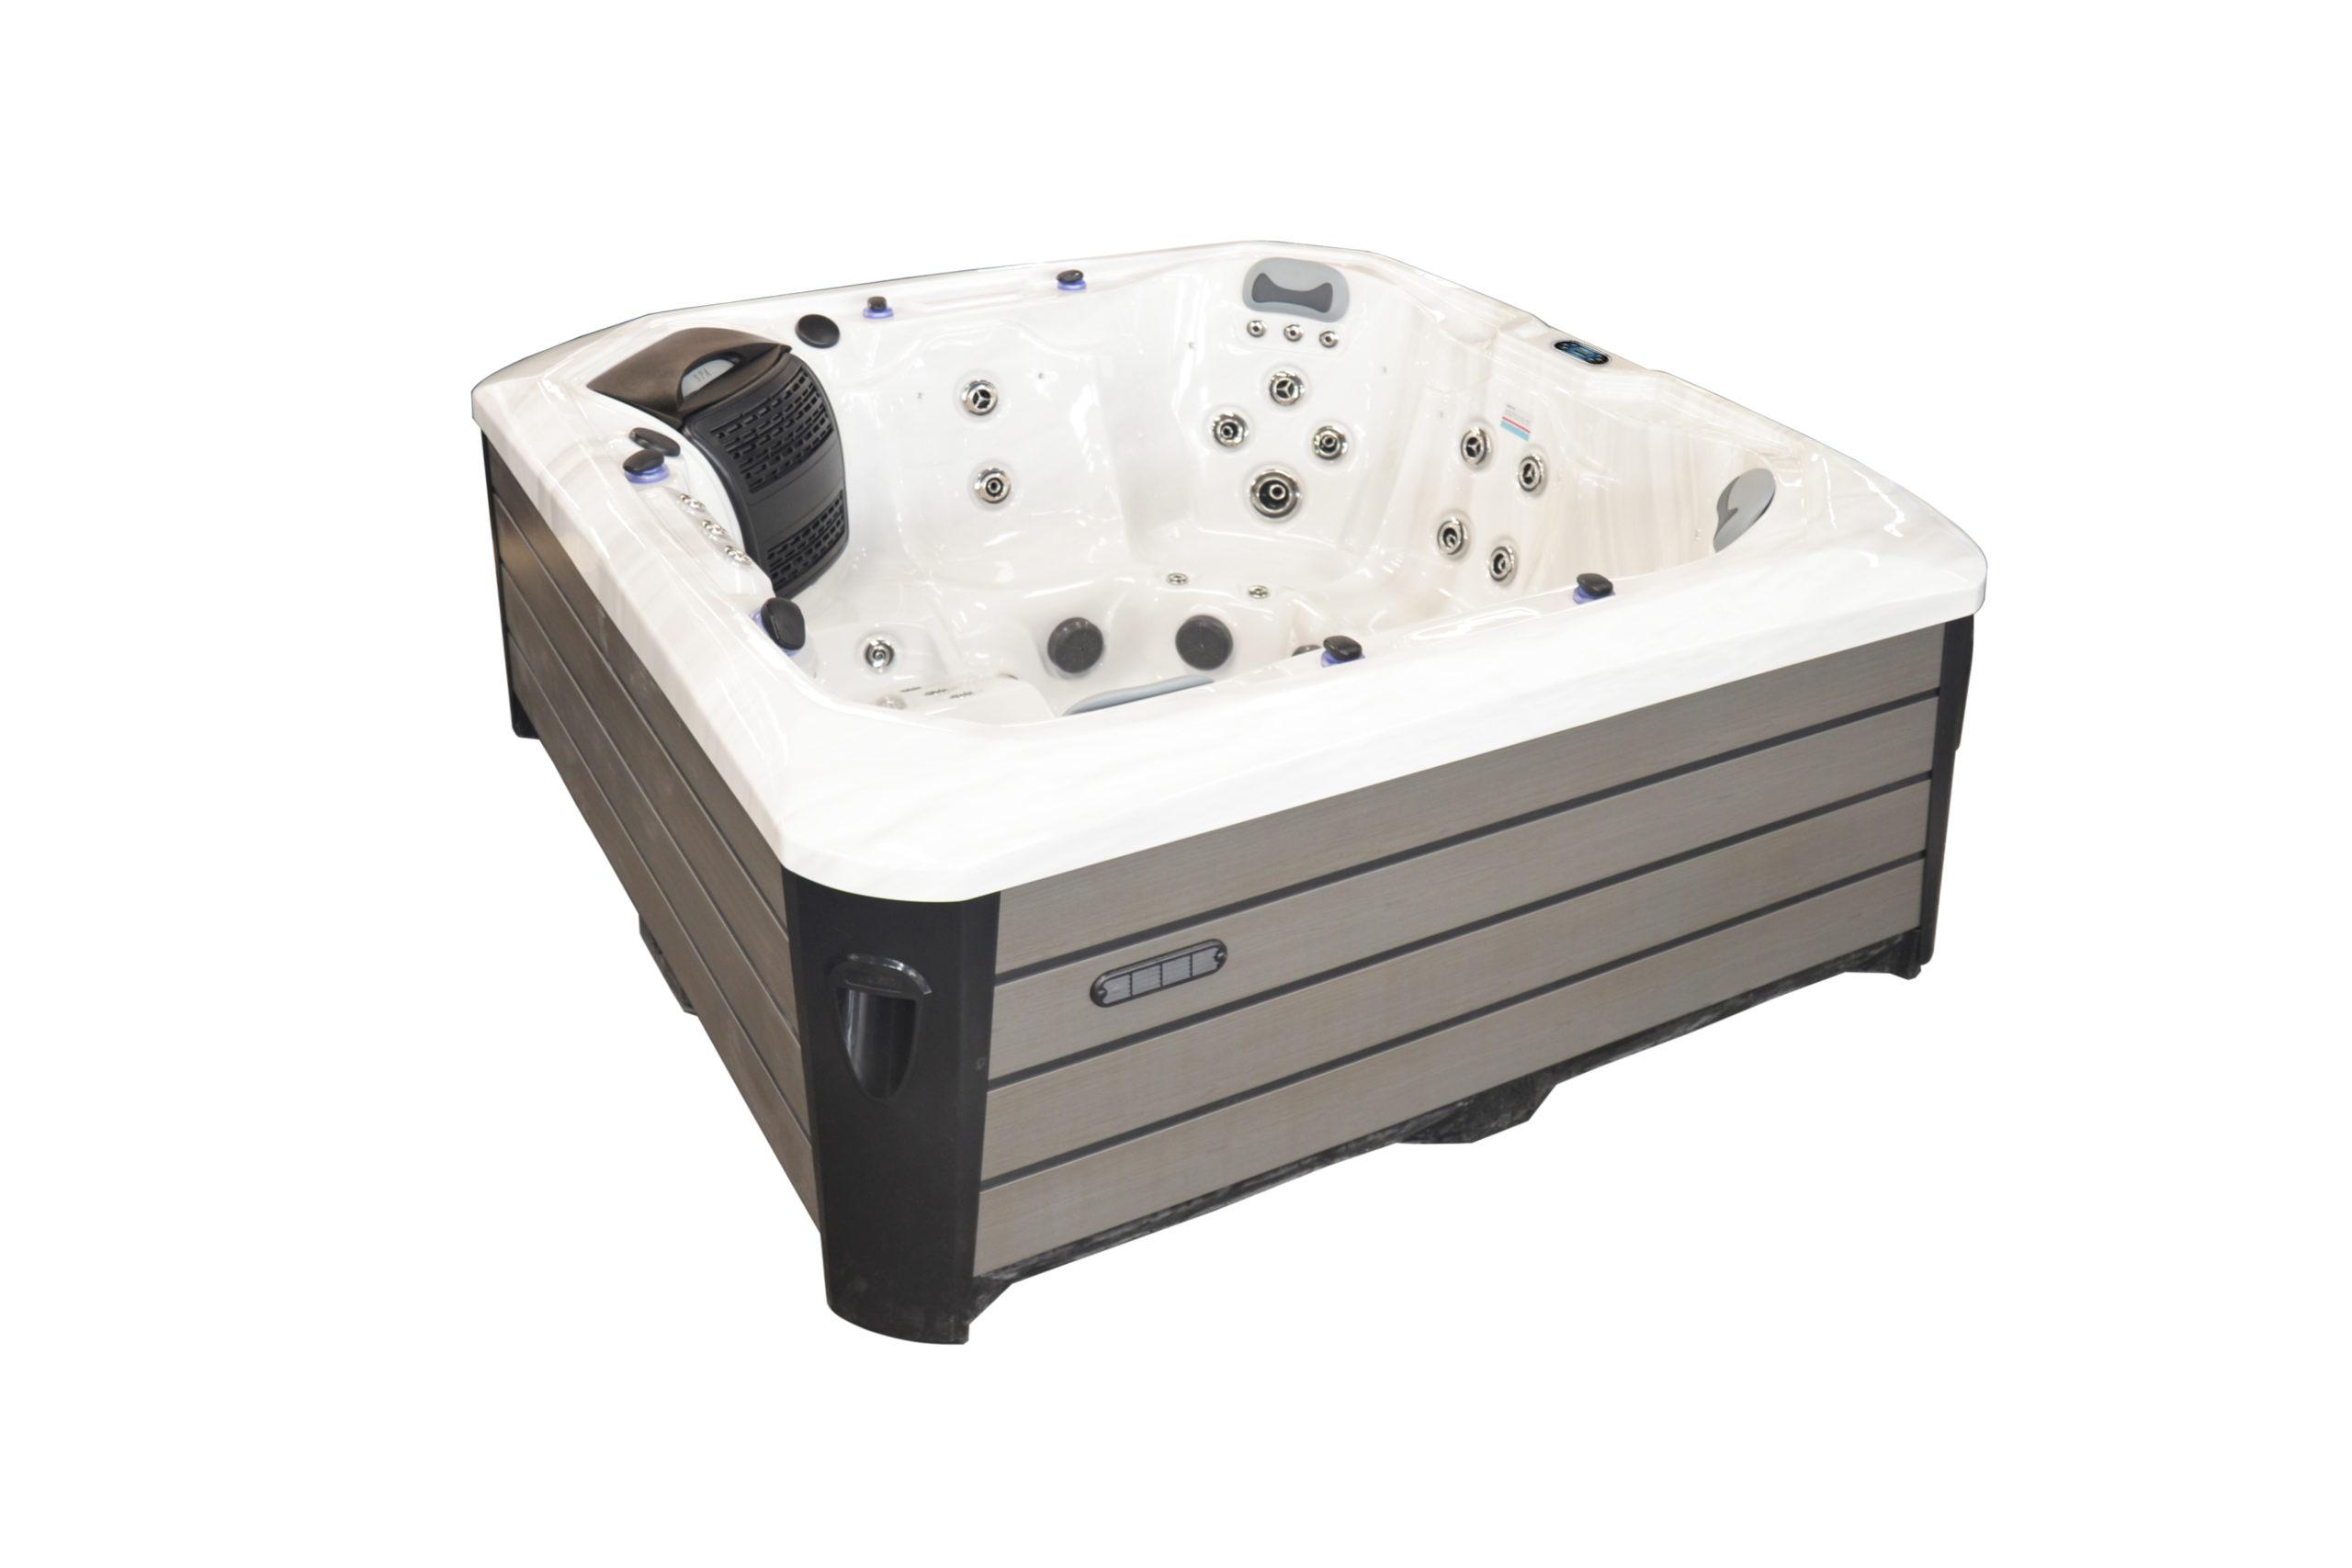 Brand New Hot Tub Spa – Comfort Hot Tubs Brand (806)